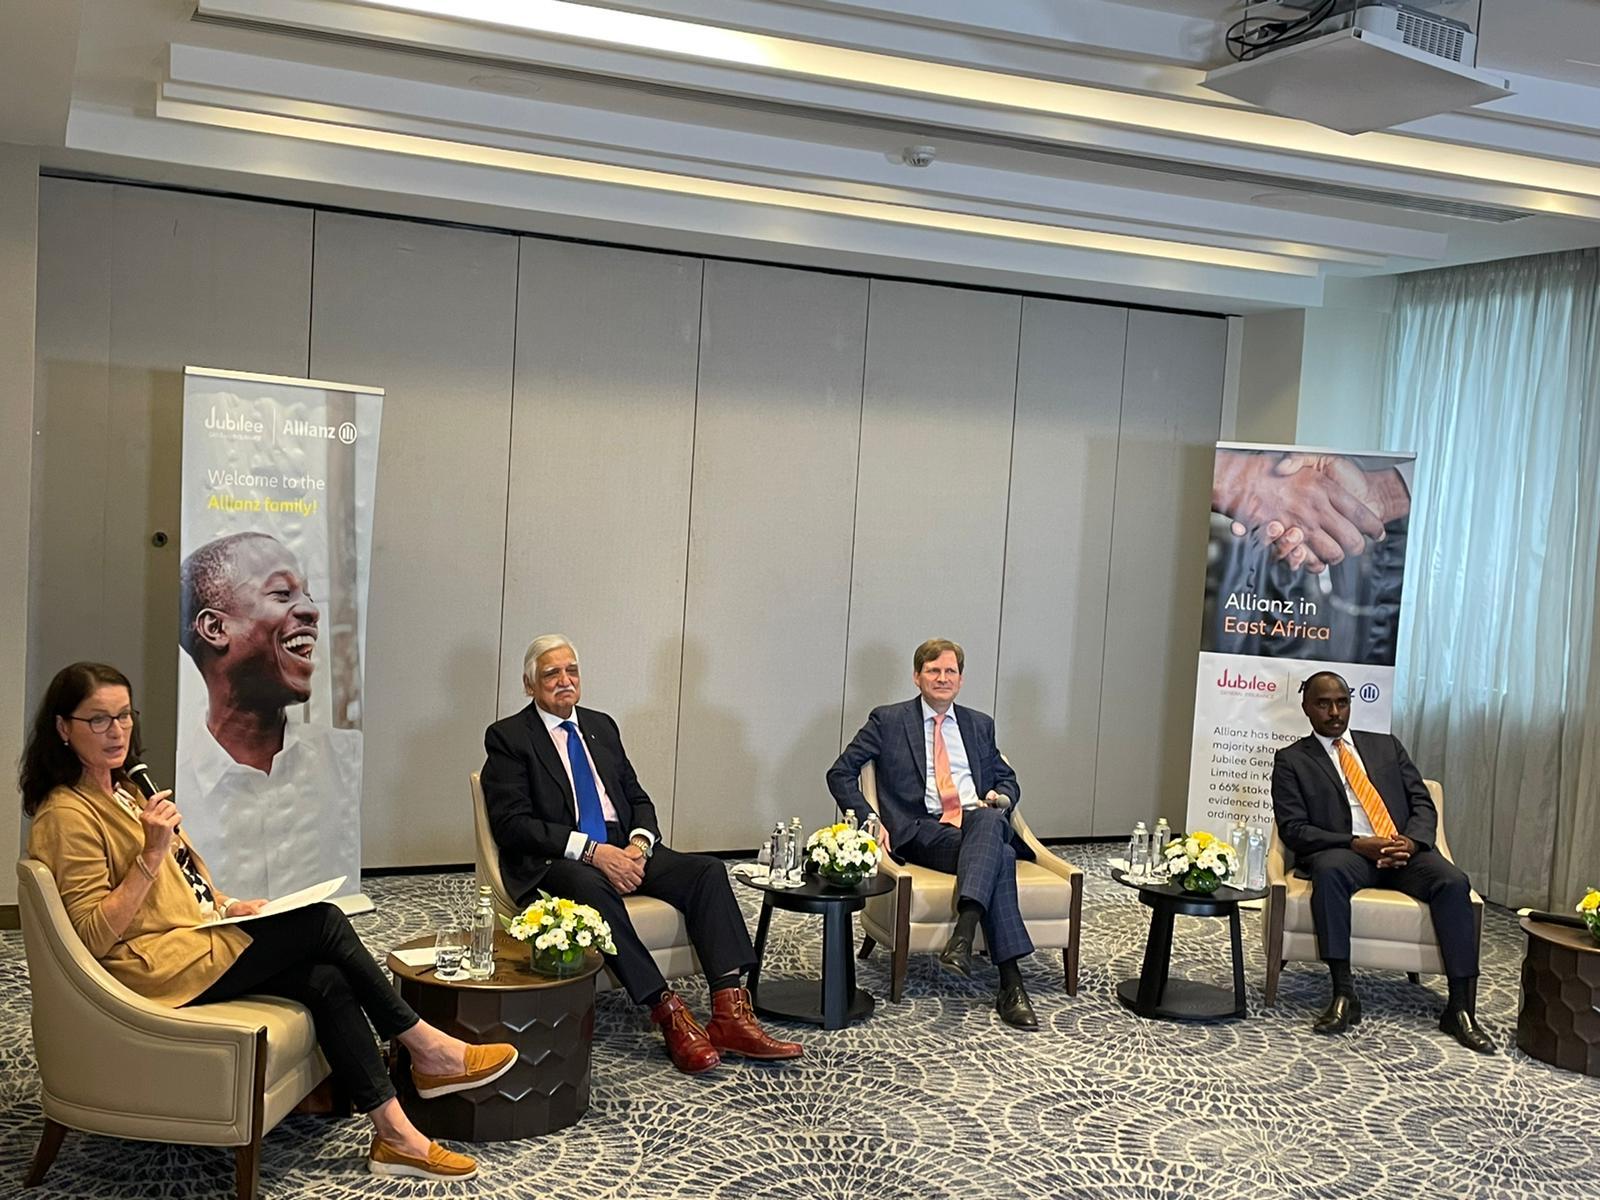 Allianz completes acquisition of Jubilee General Insurance-Kenya